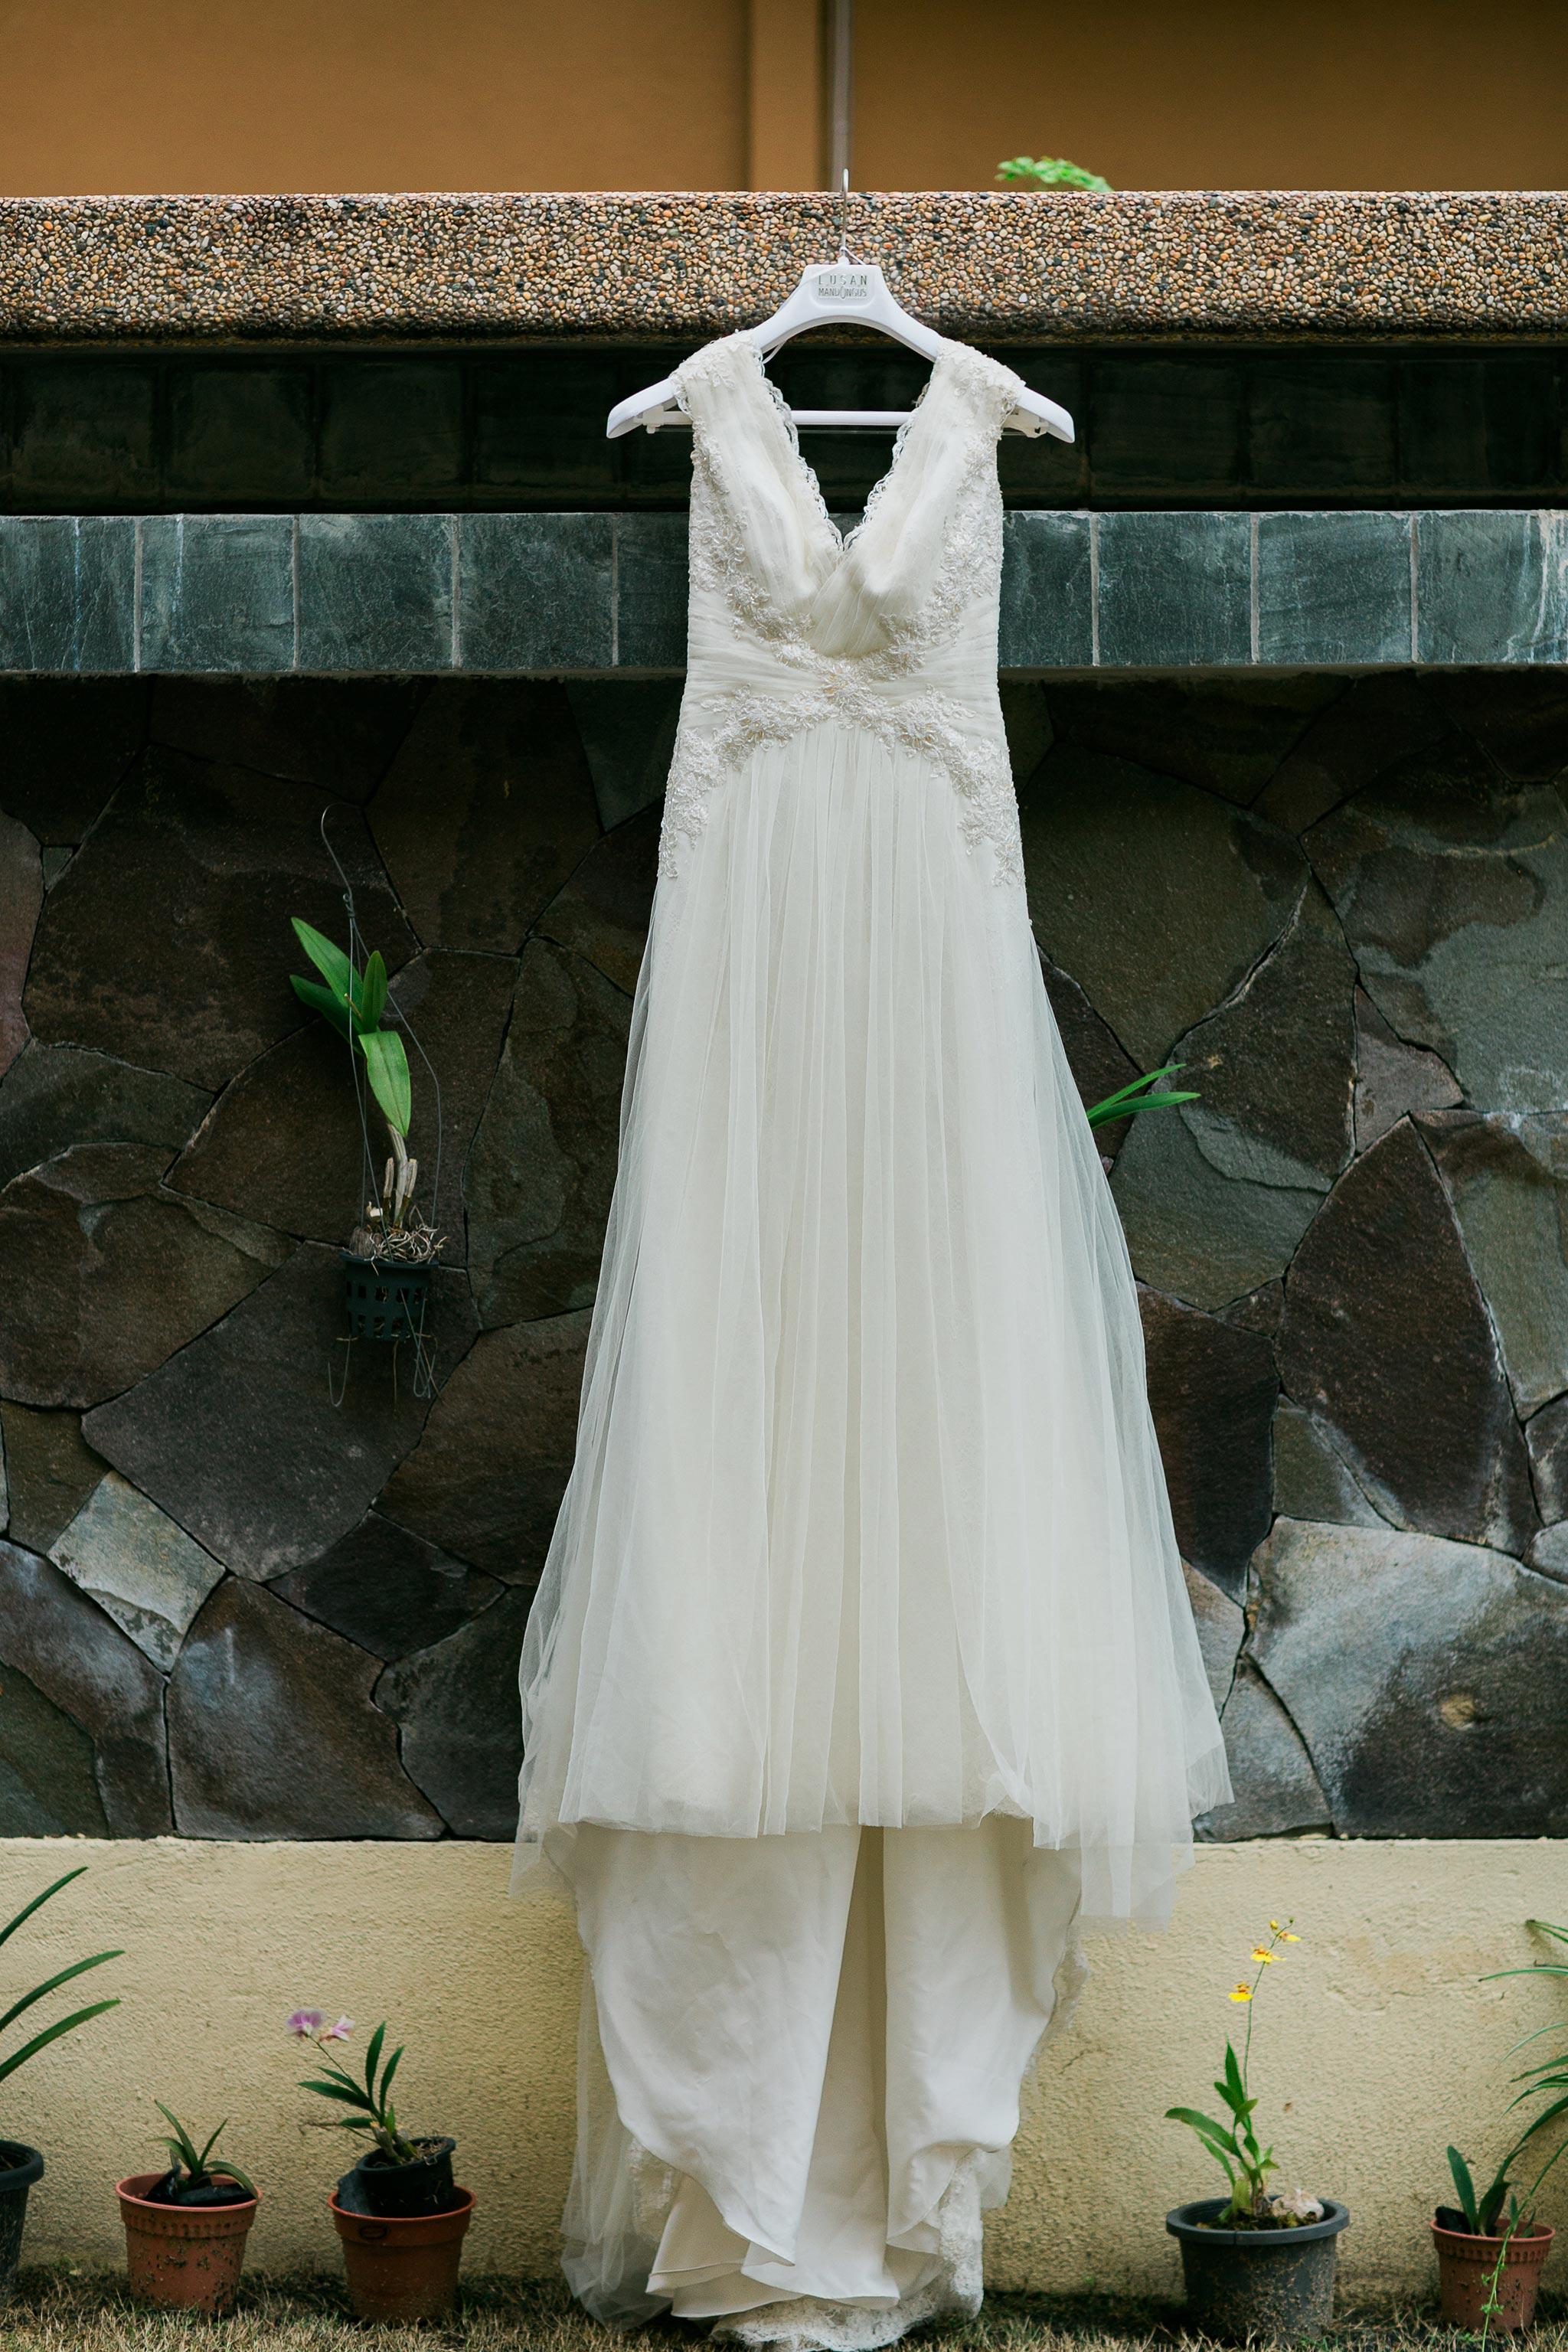 Bankers-Club-Kuala-Lumpur-Wedding-dress